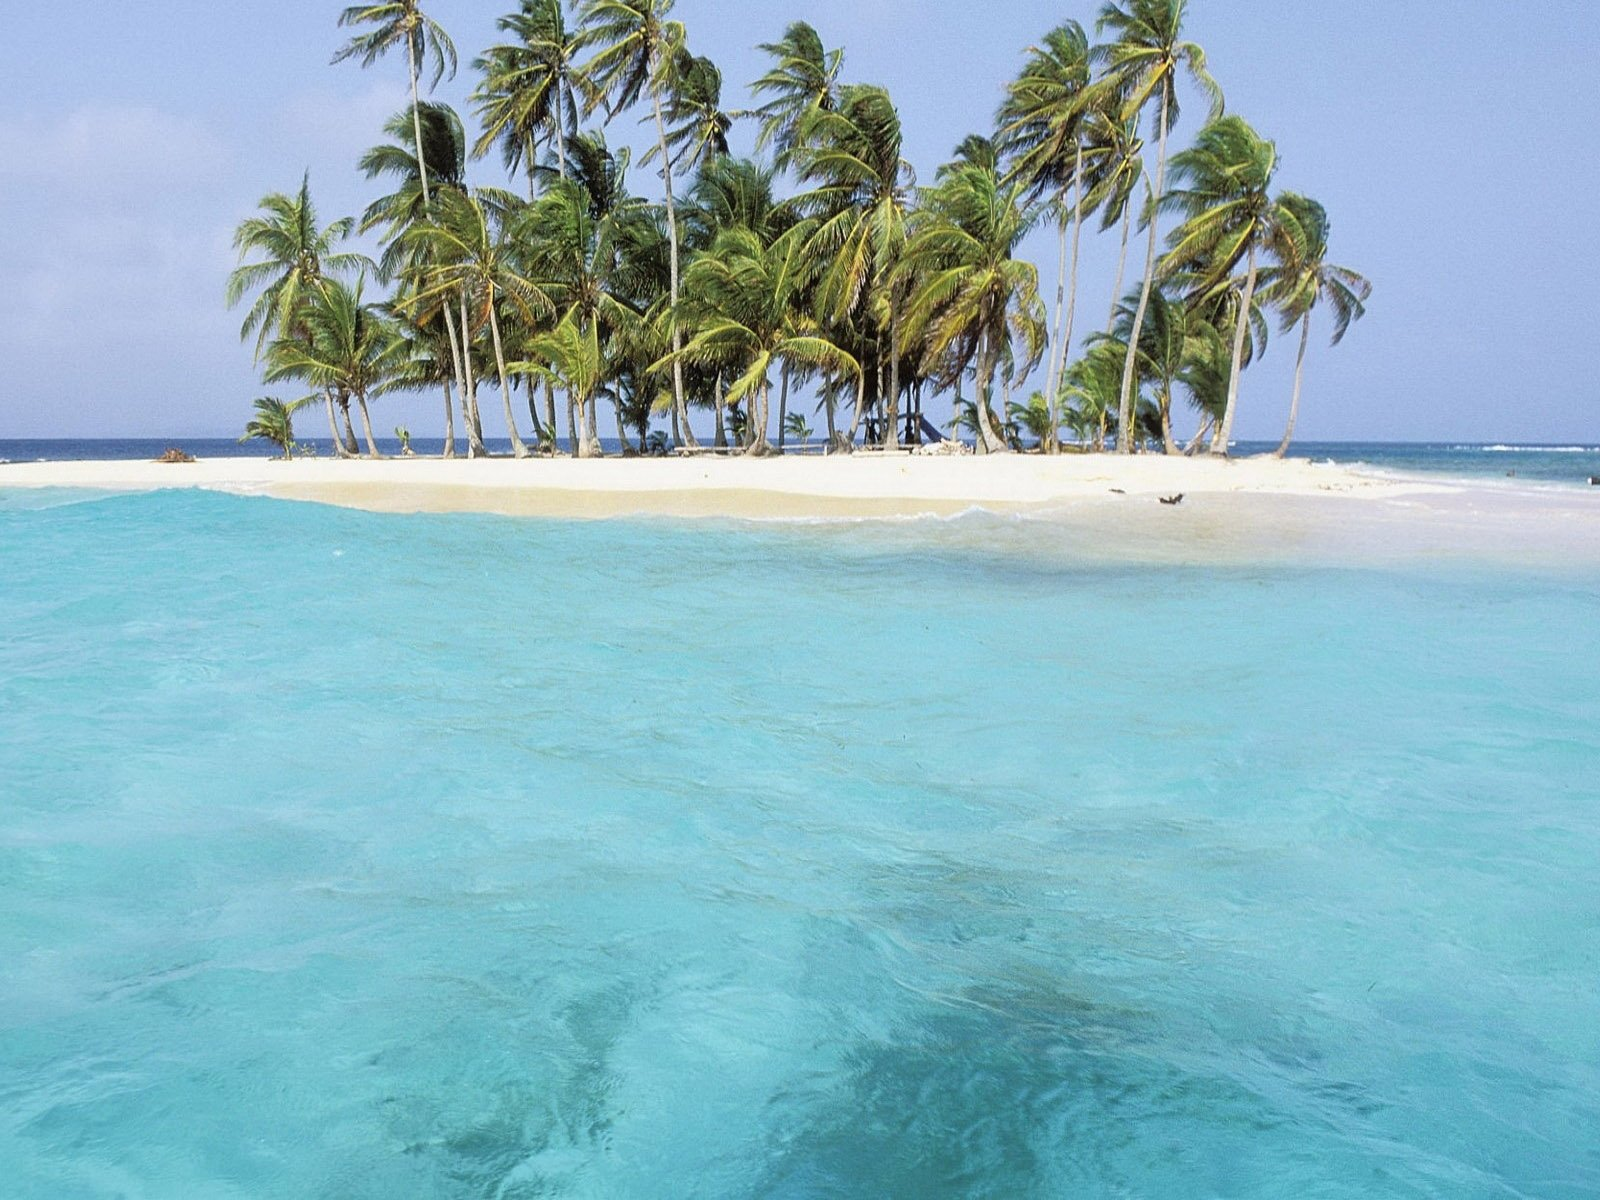 Ipad Wallpaper Beach Scenes: Beautiful Beach Scenes Wallpaper